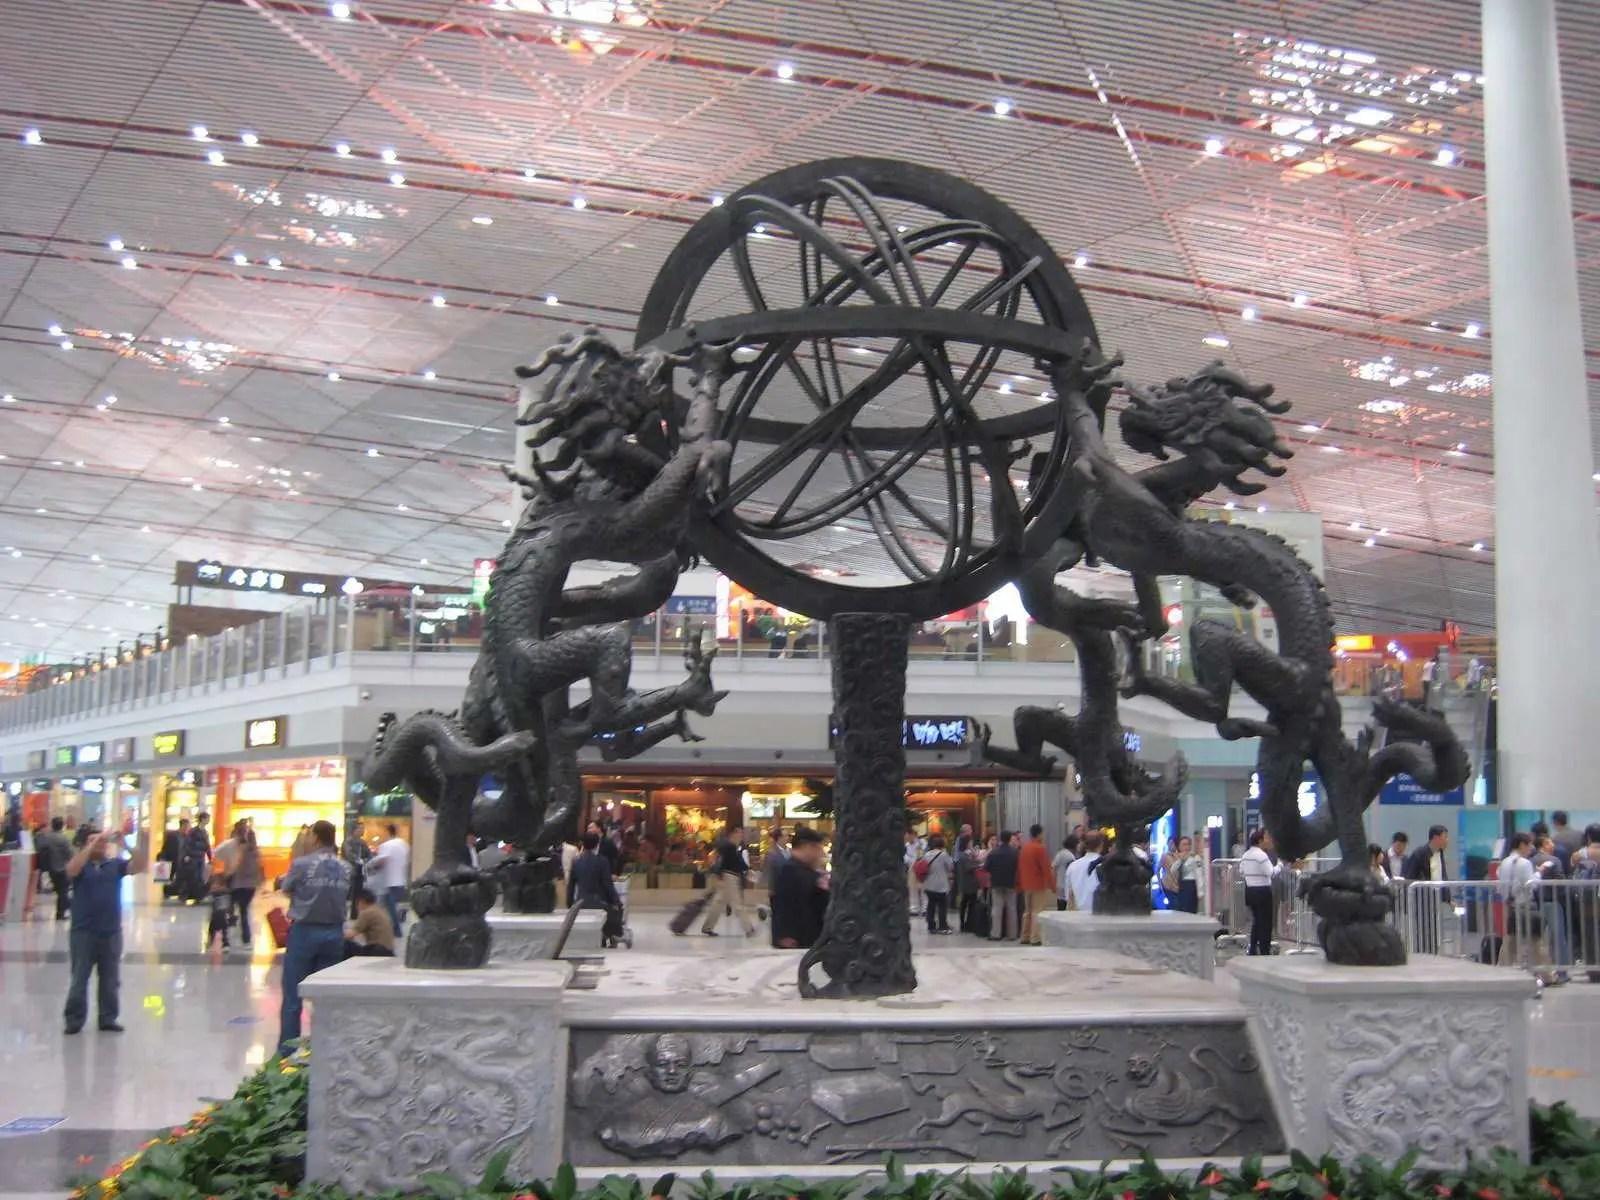 10. Beijing Capital International Airport (PEK)